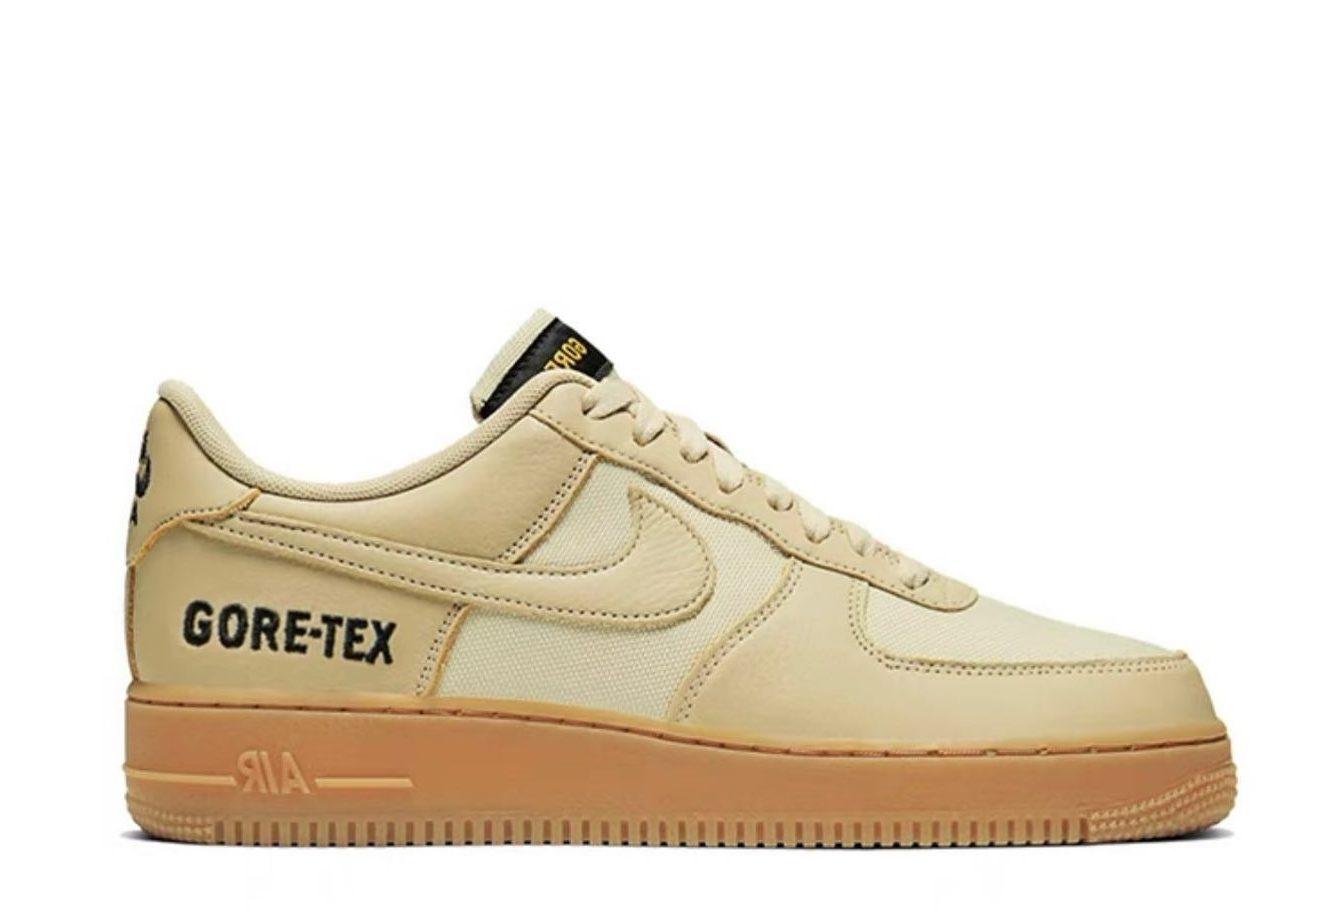 Krossovki-Nike-Air-Force-1-Gore-Tex-White-e1632586533367